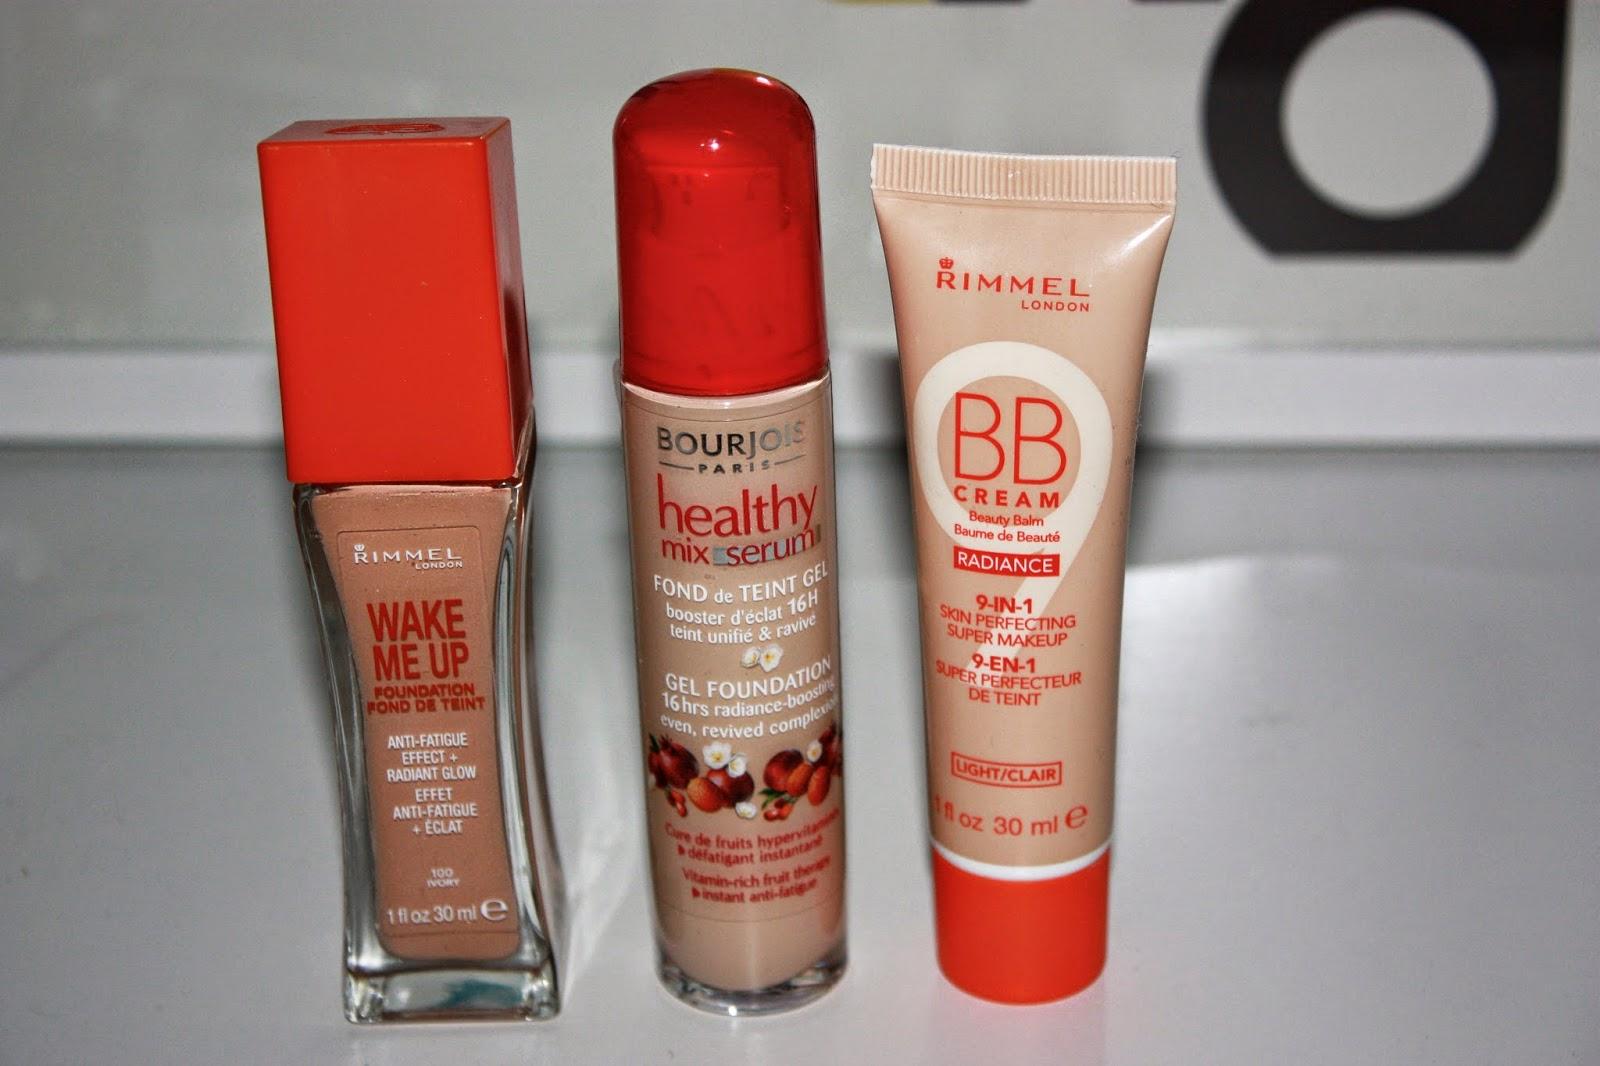 top[ drugstore foundations, rimmel wake me up, bourjois healthy mix serum, rimmel radiance bb cream 9-in-1